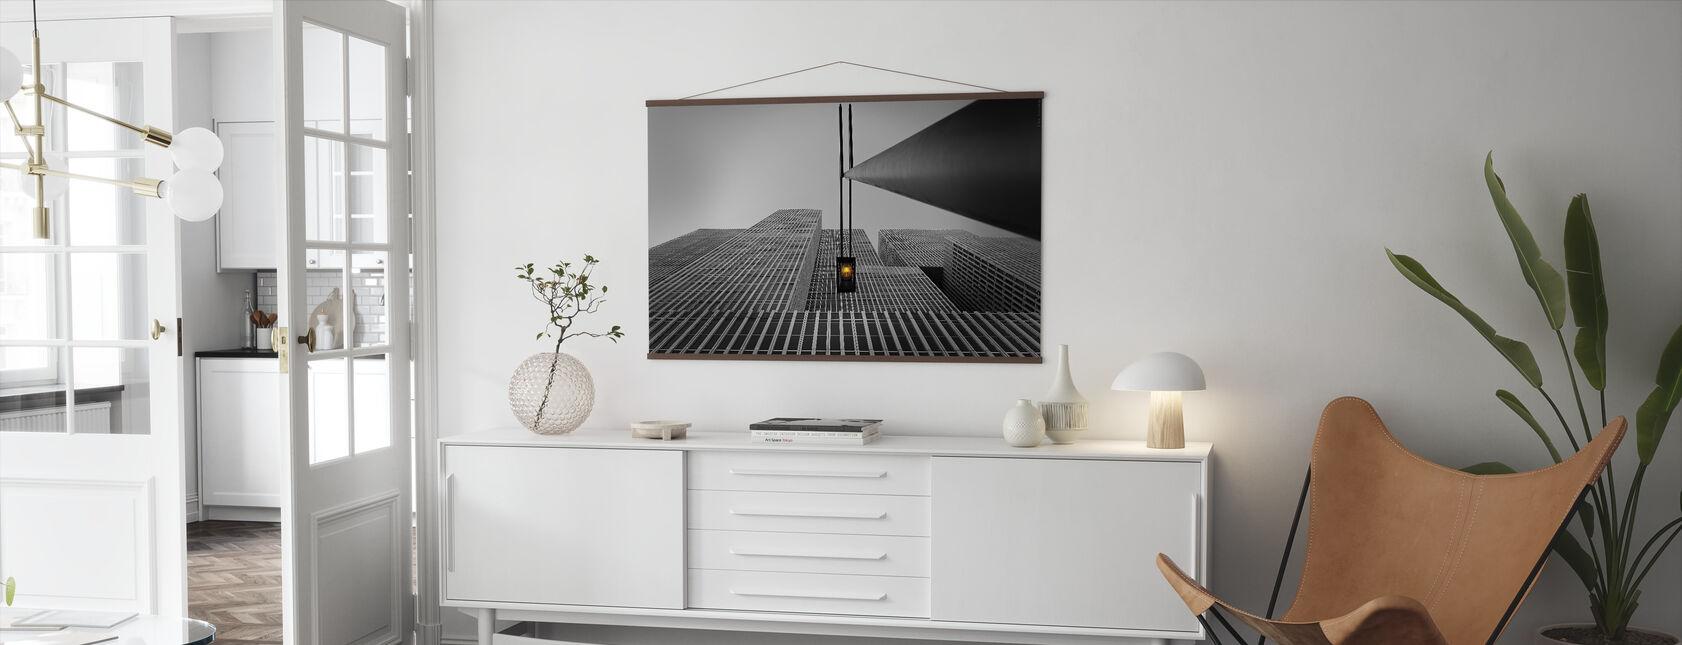 Yellow Light - Poster - Living Room